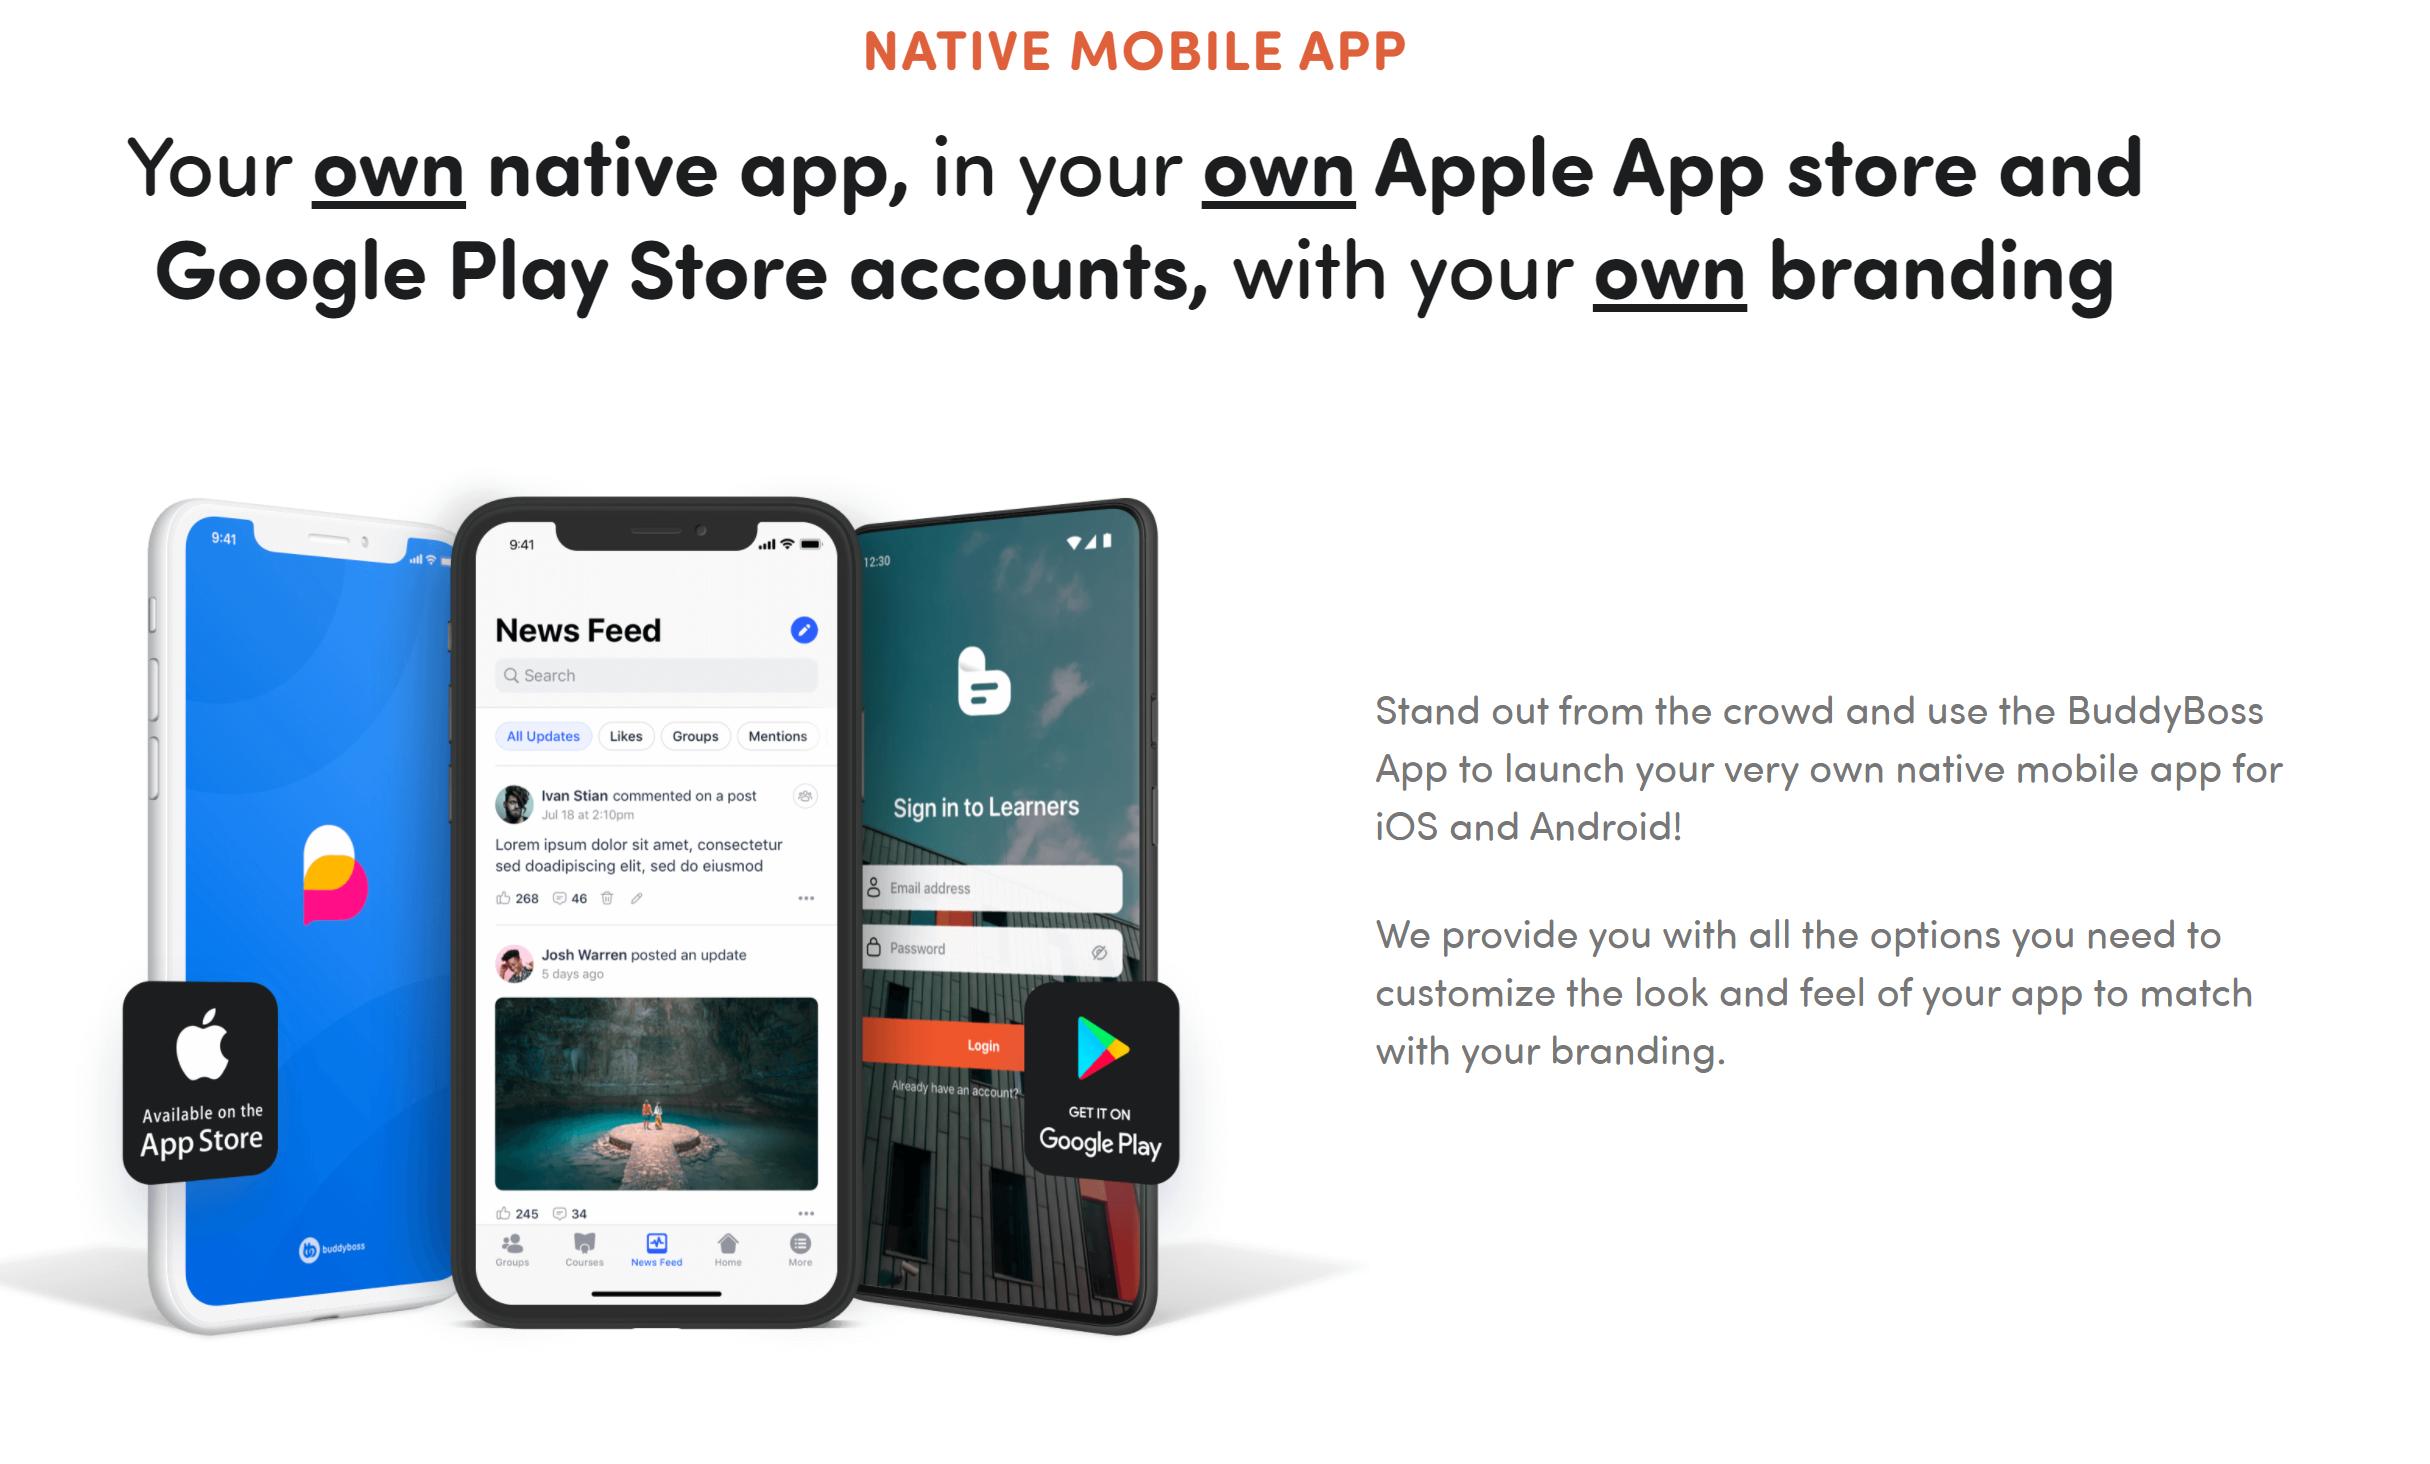 Buddyboss native app